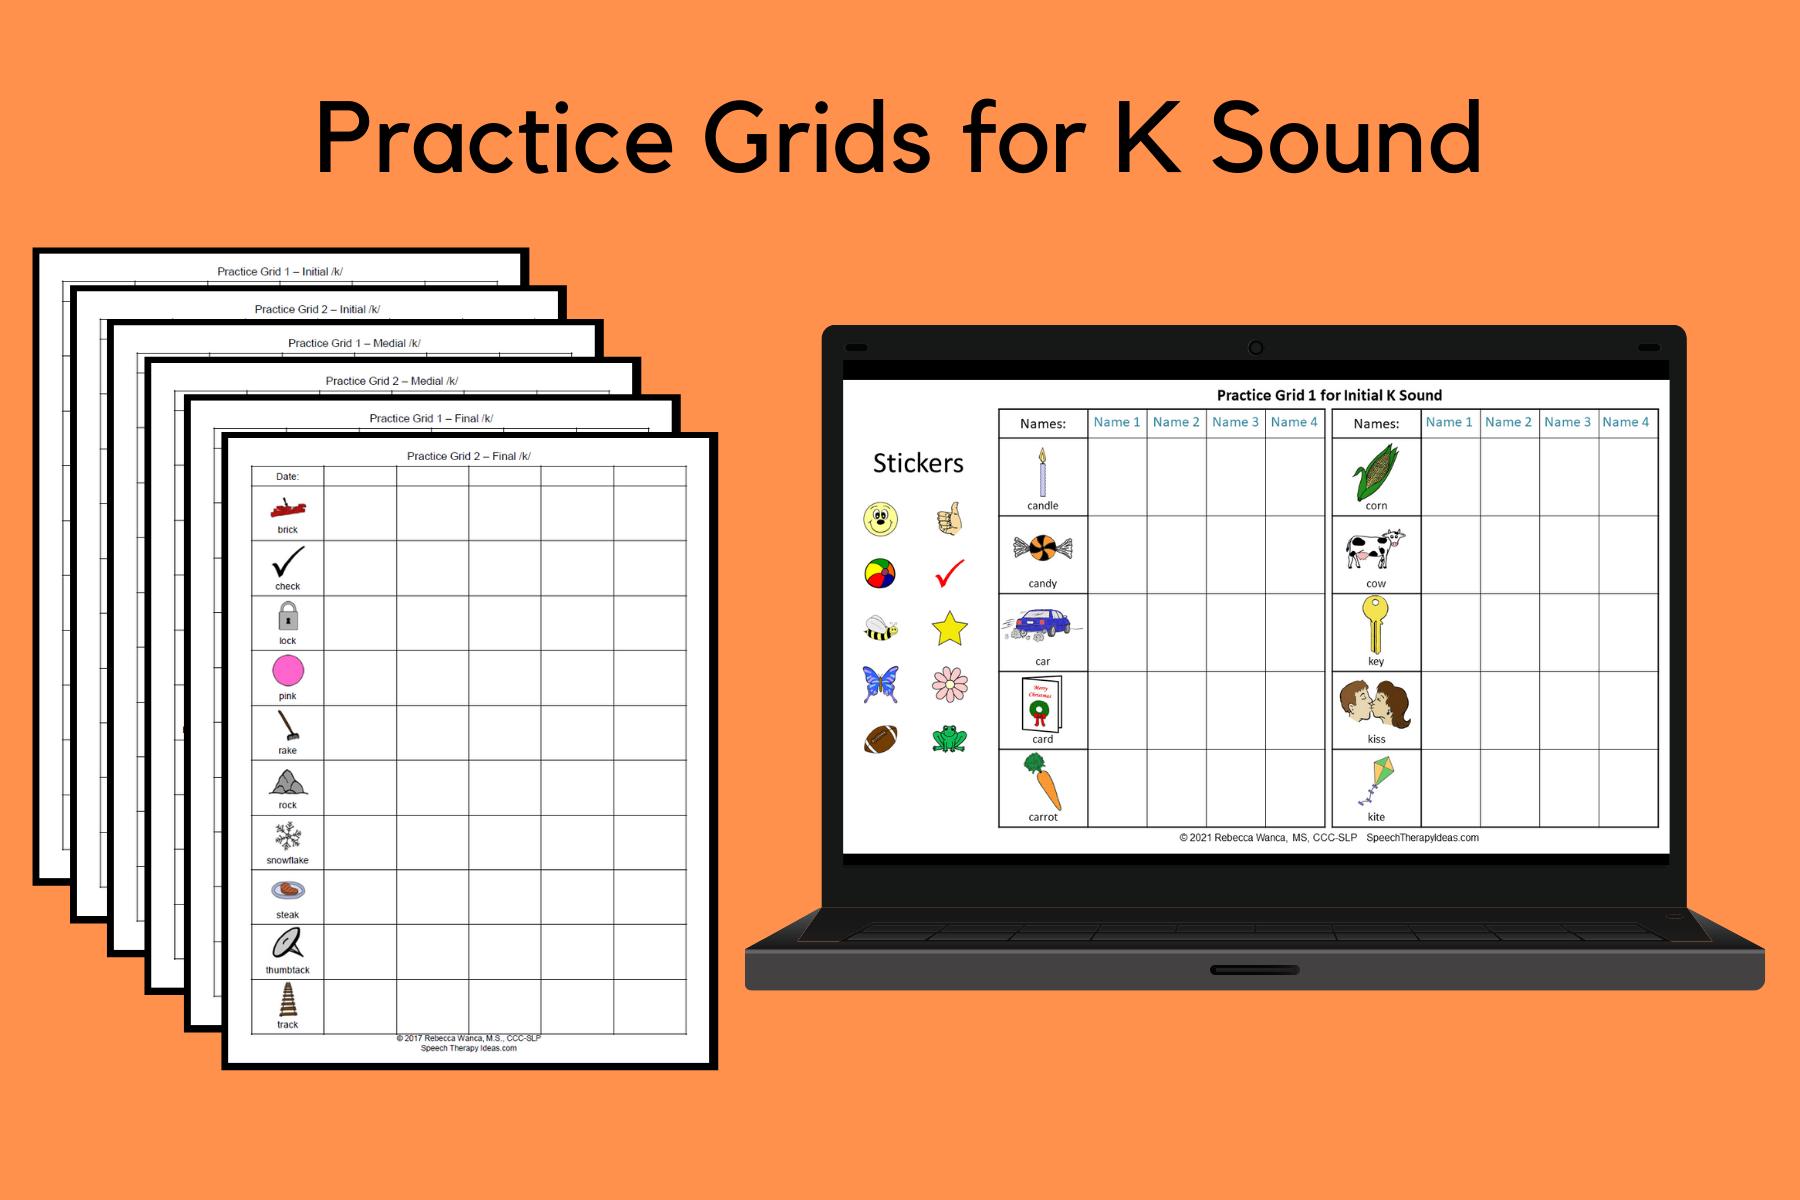 Practice Grids for K Sound